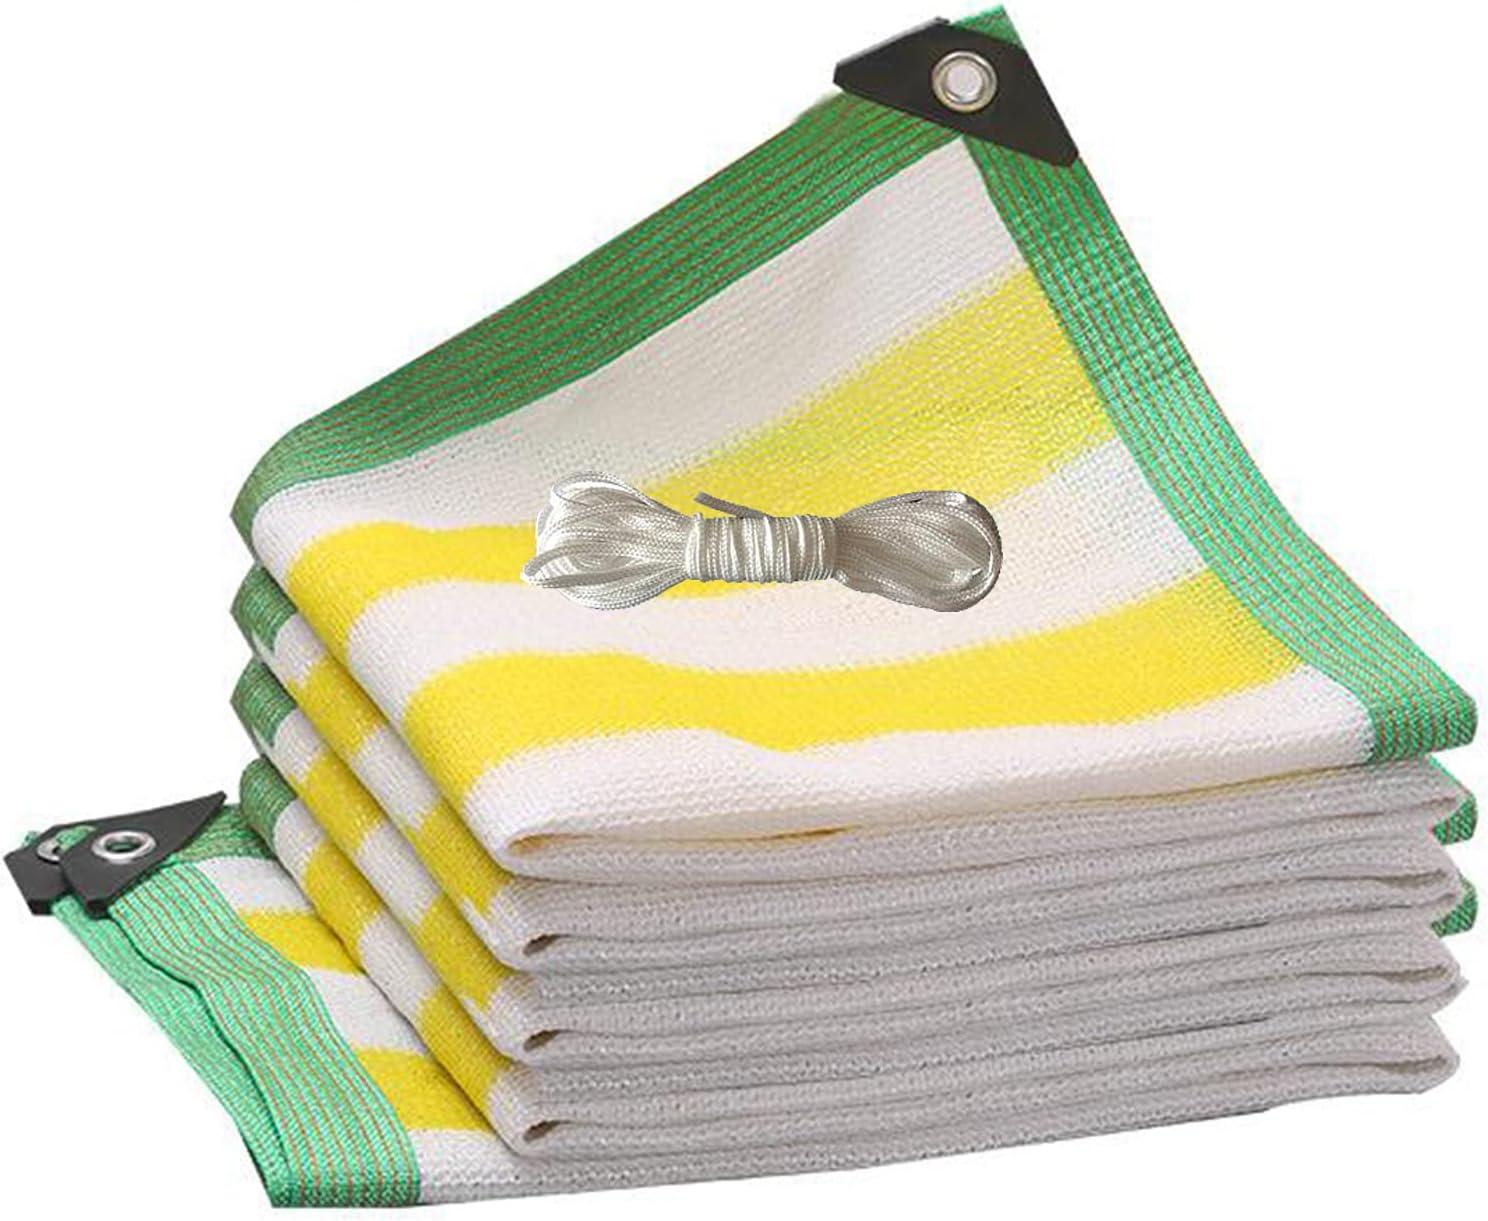 Sun Shade Net 80% UV Block HDPE Rectangle specialty shop Sunscr Tear New item Resistant